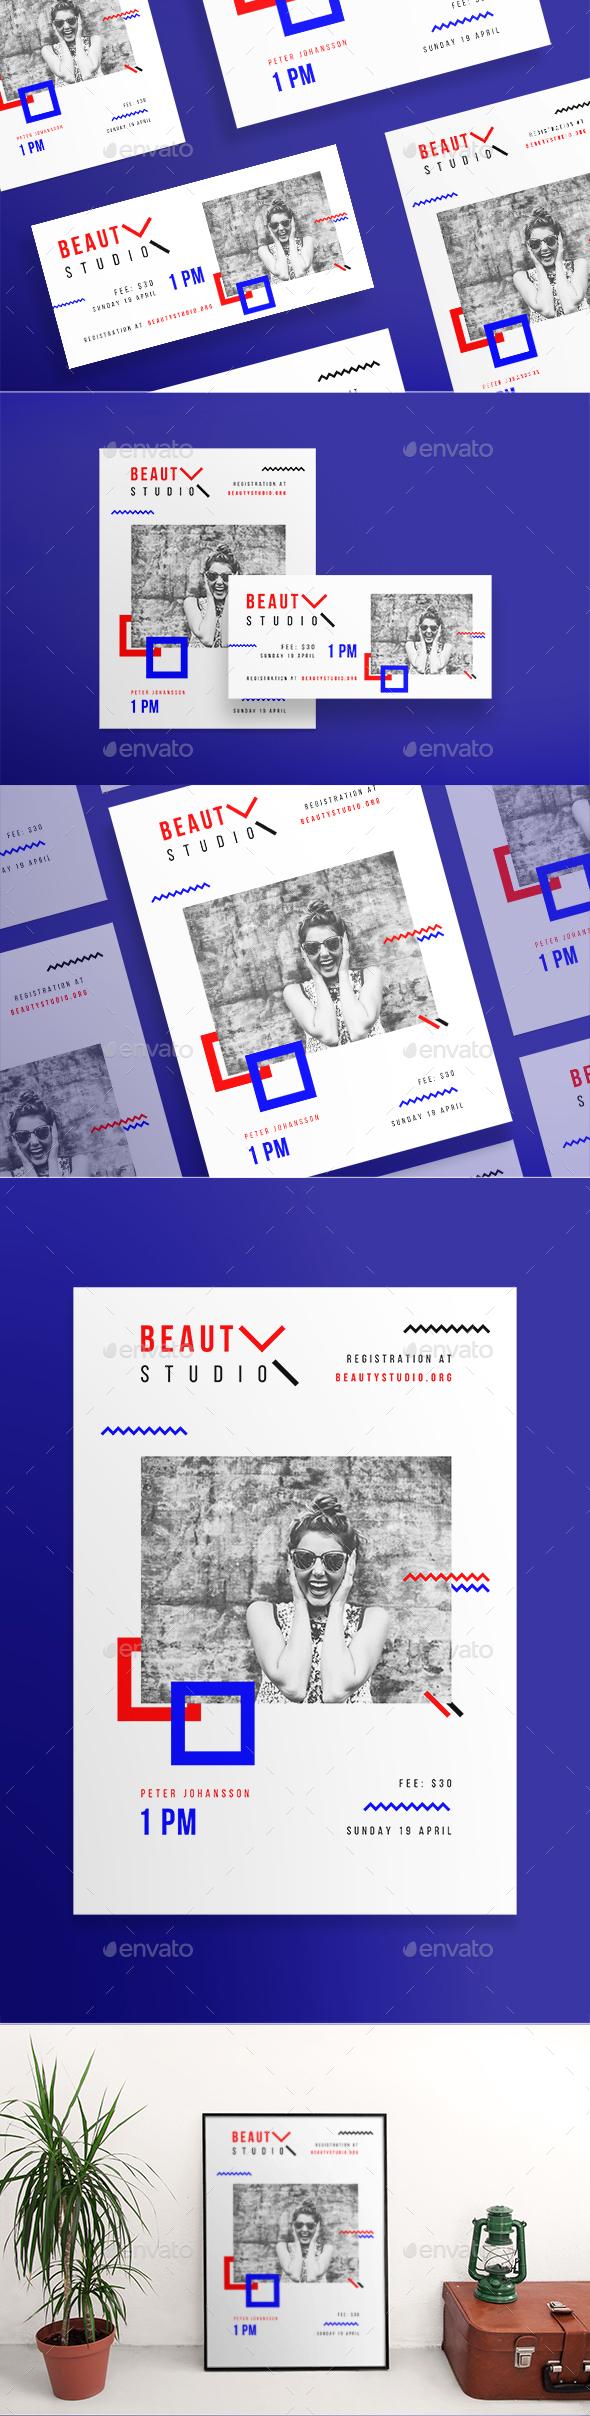 Beauty Studio Flyers - Miscellaneous Events